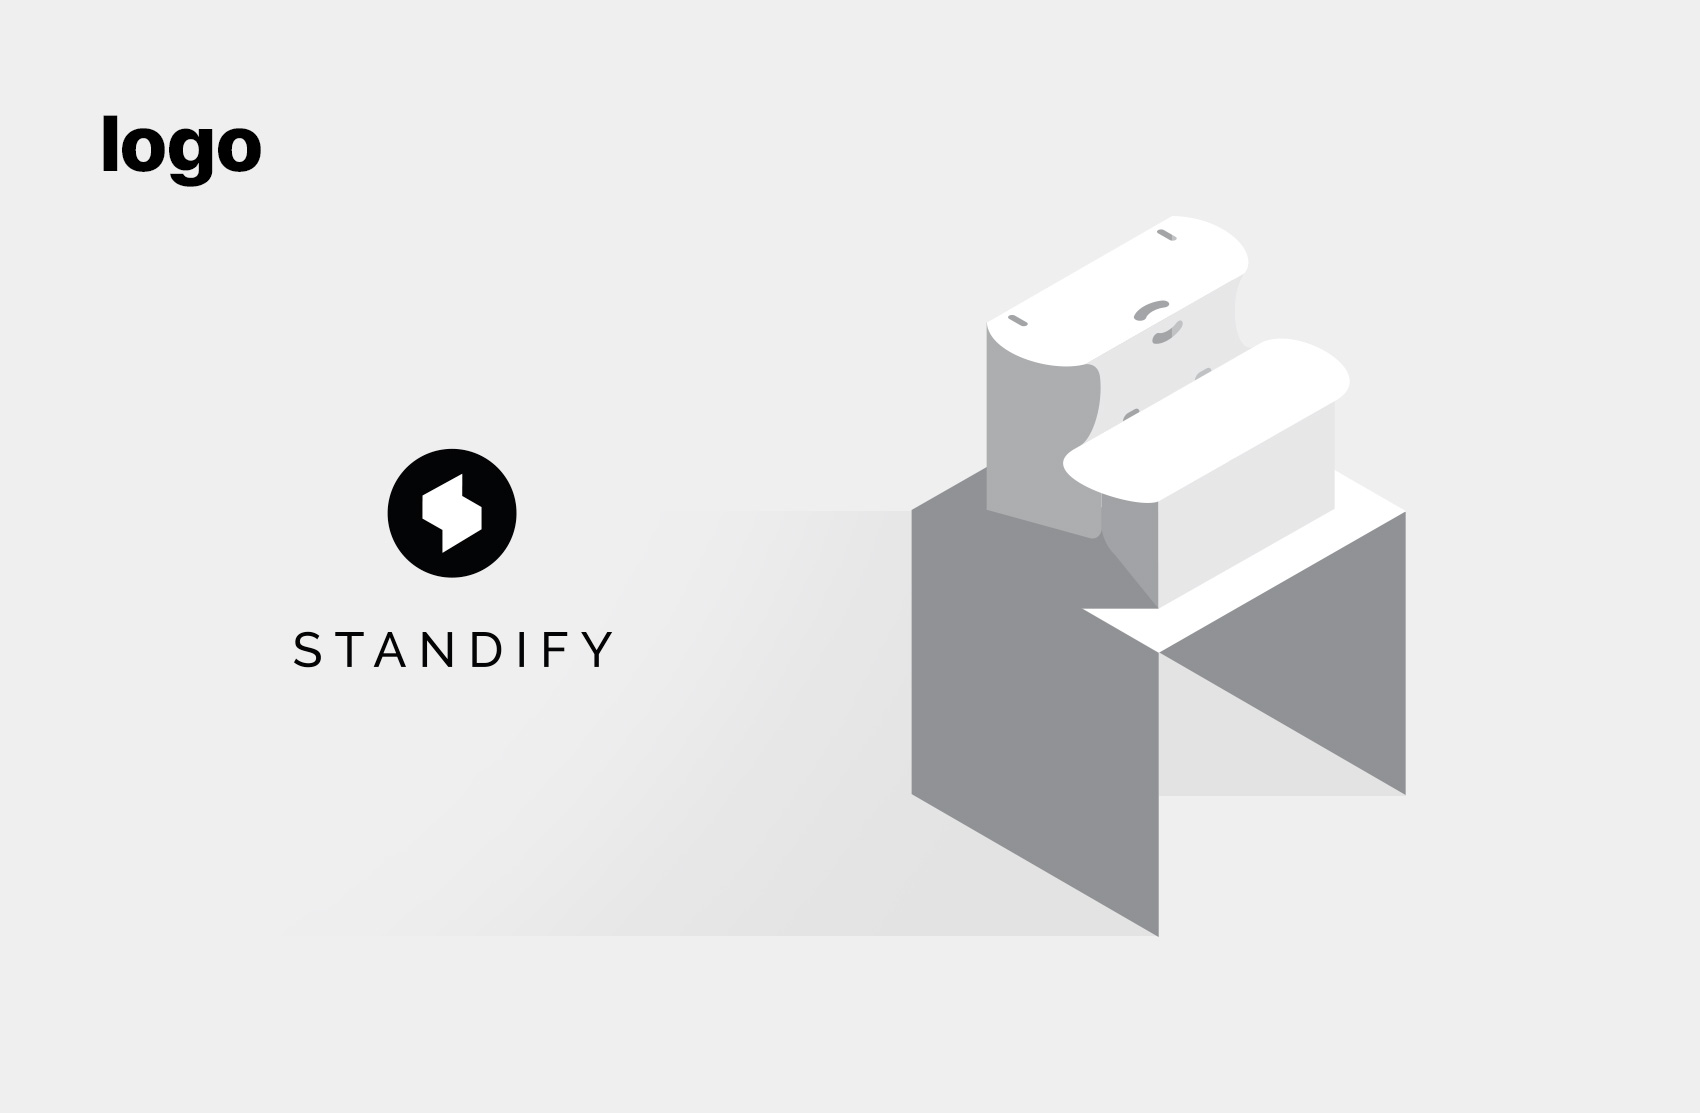 Standify logo